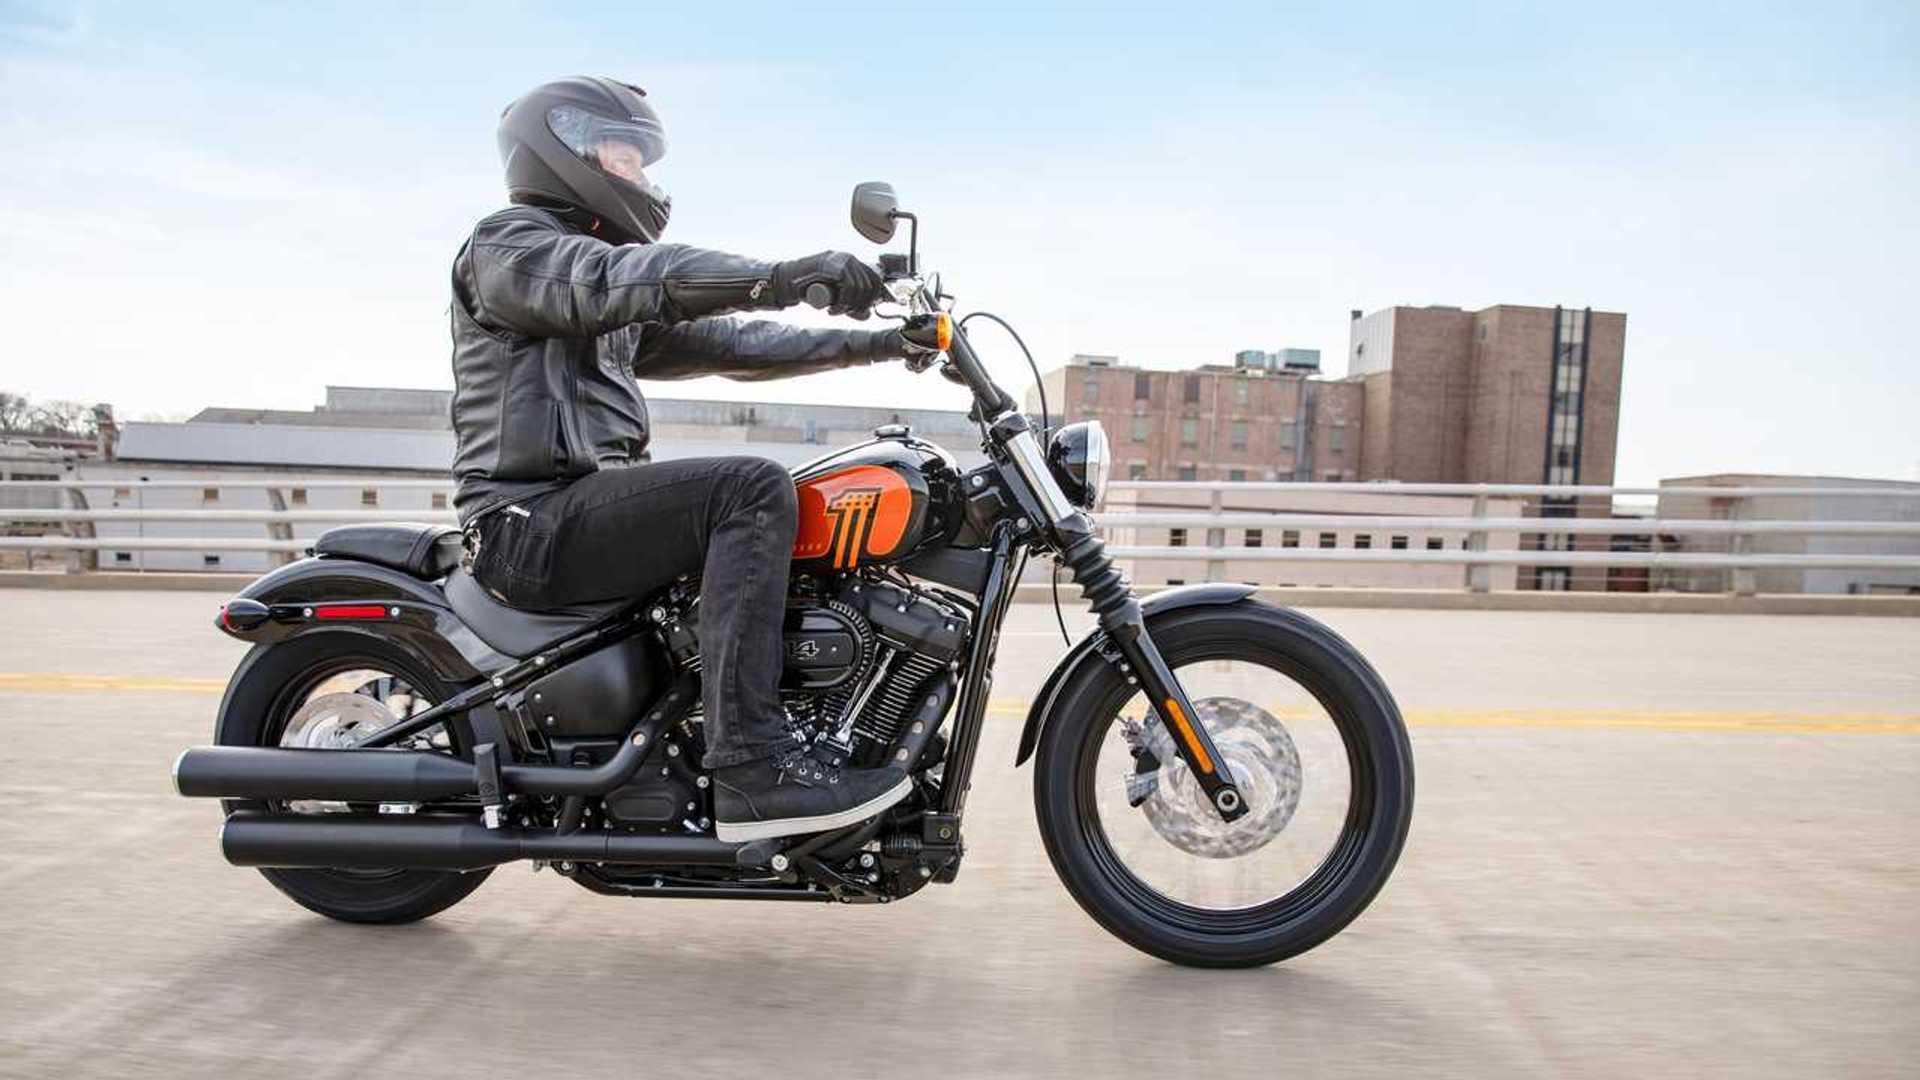 Harley-Davidson Street Bob 114 2021 2021-harley-davidson-street-bob-114---riding